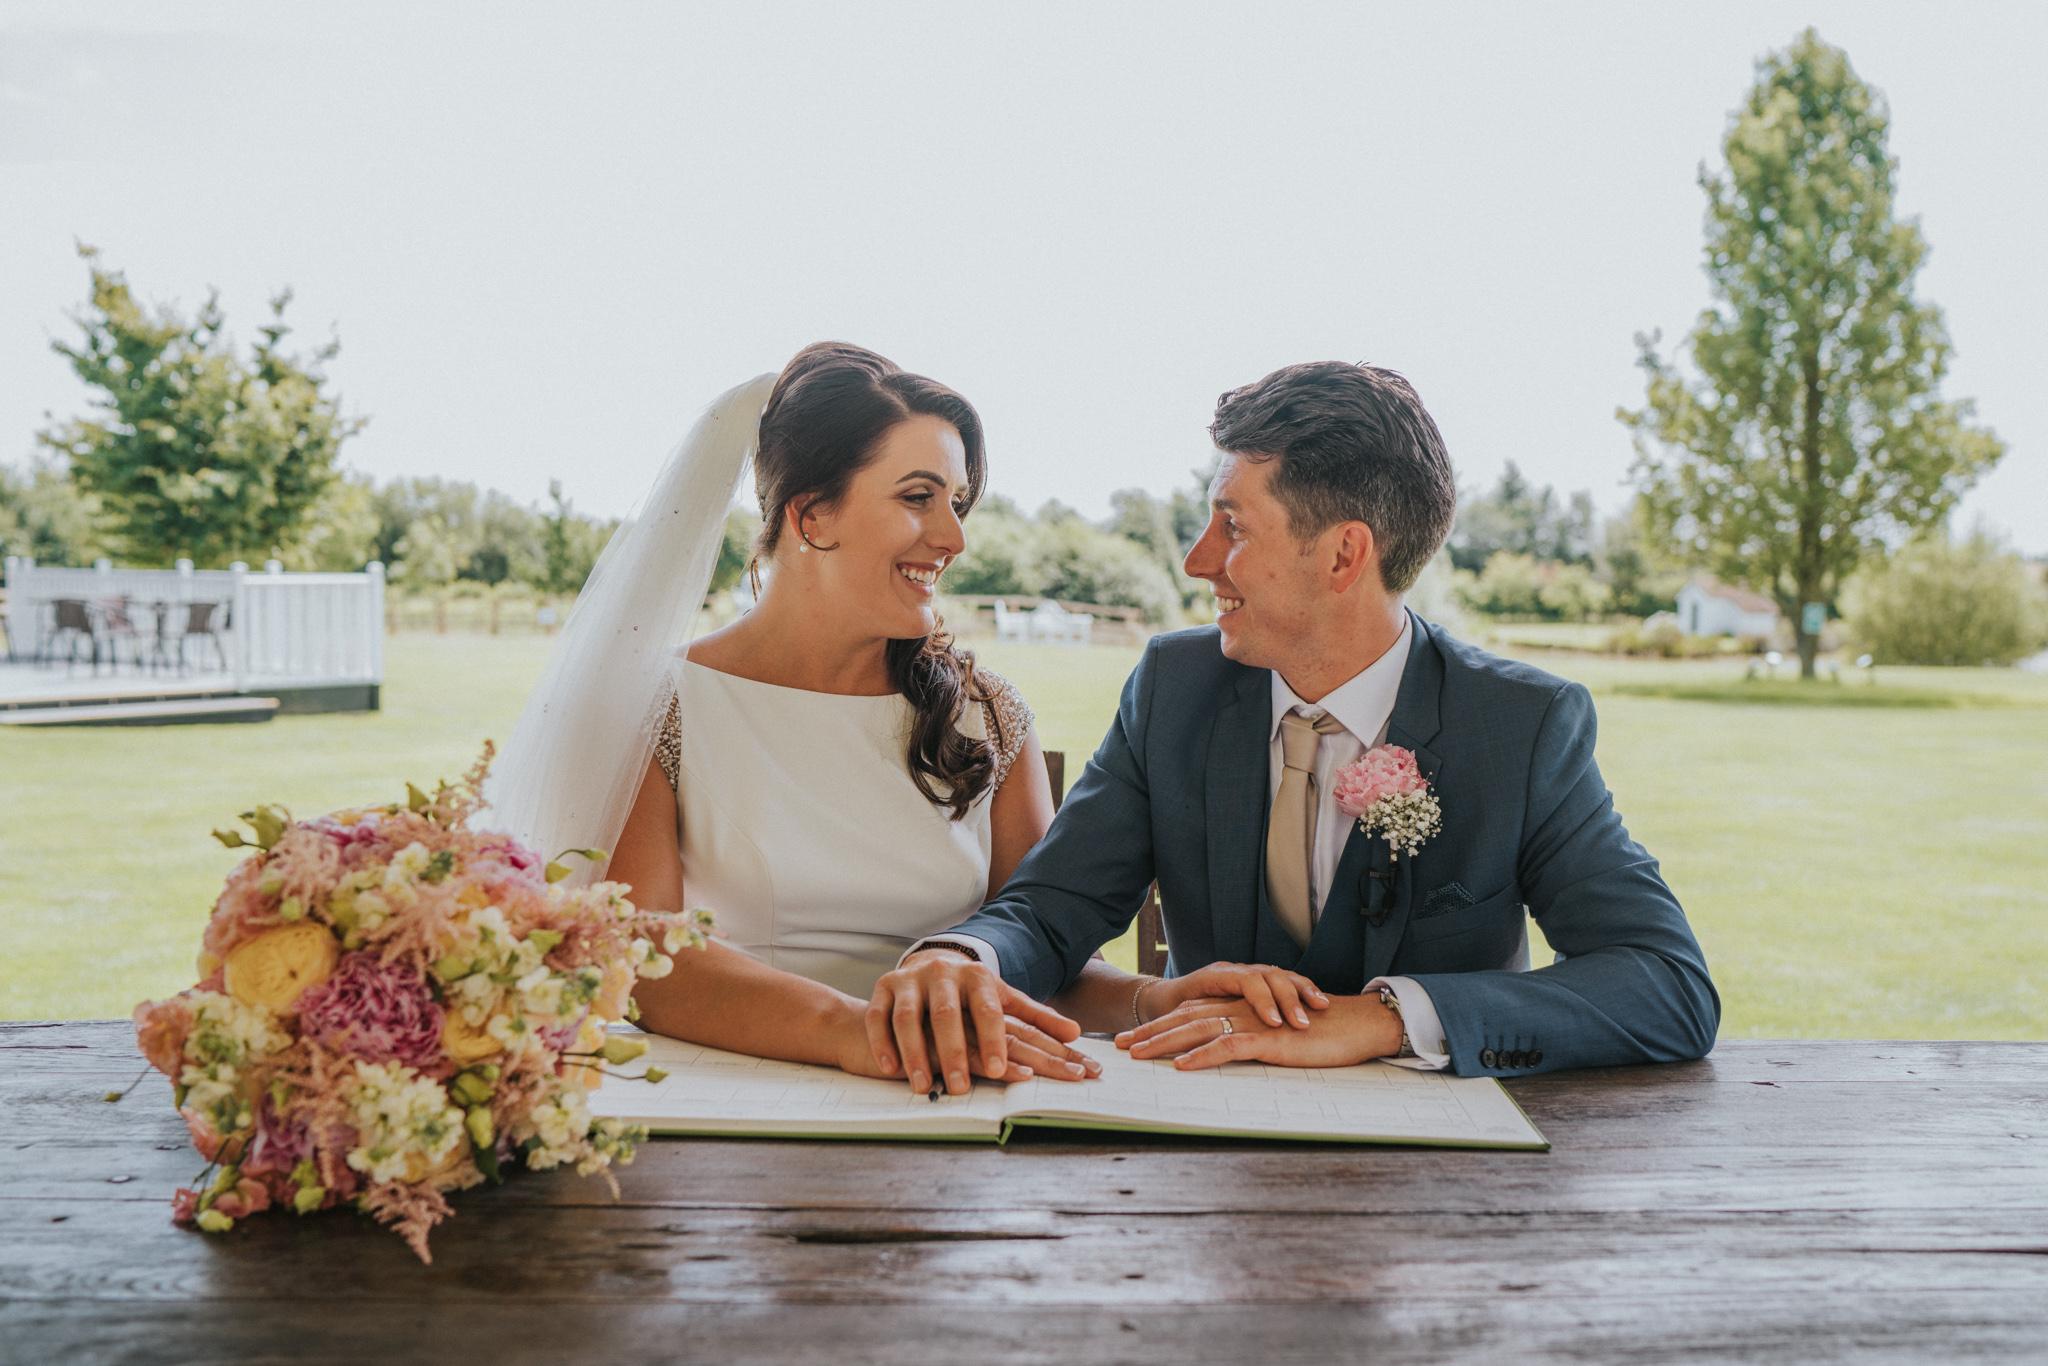 danielle-and-gareths-boho-wedding-previews-at-high-house-weddings-grace-elizabeth-colchester-essex-suffolk-norfolk-devon-alternative-wedding-and-lifestyle-photographer (31 of 76).jpg